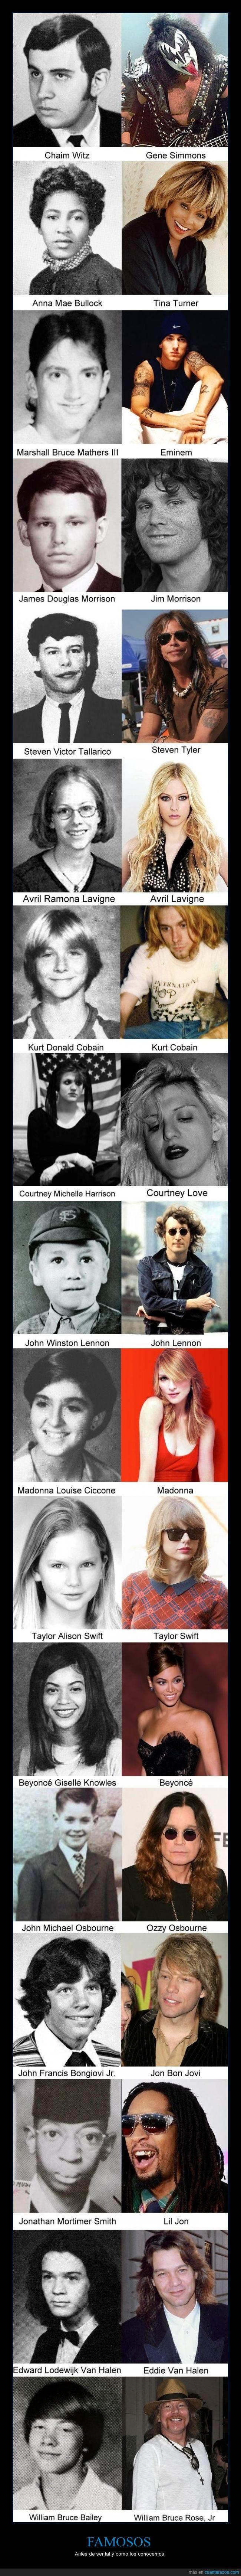 beyonce,Bon Jovi,cantante,country,famoso,famosos,madonna,musico,pop,rapero,rock,Van Halen